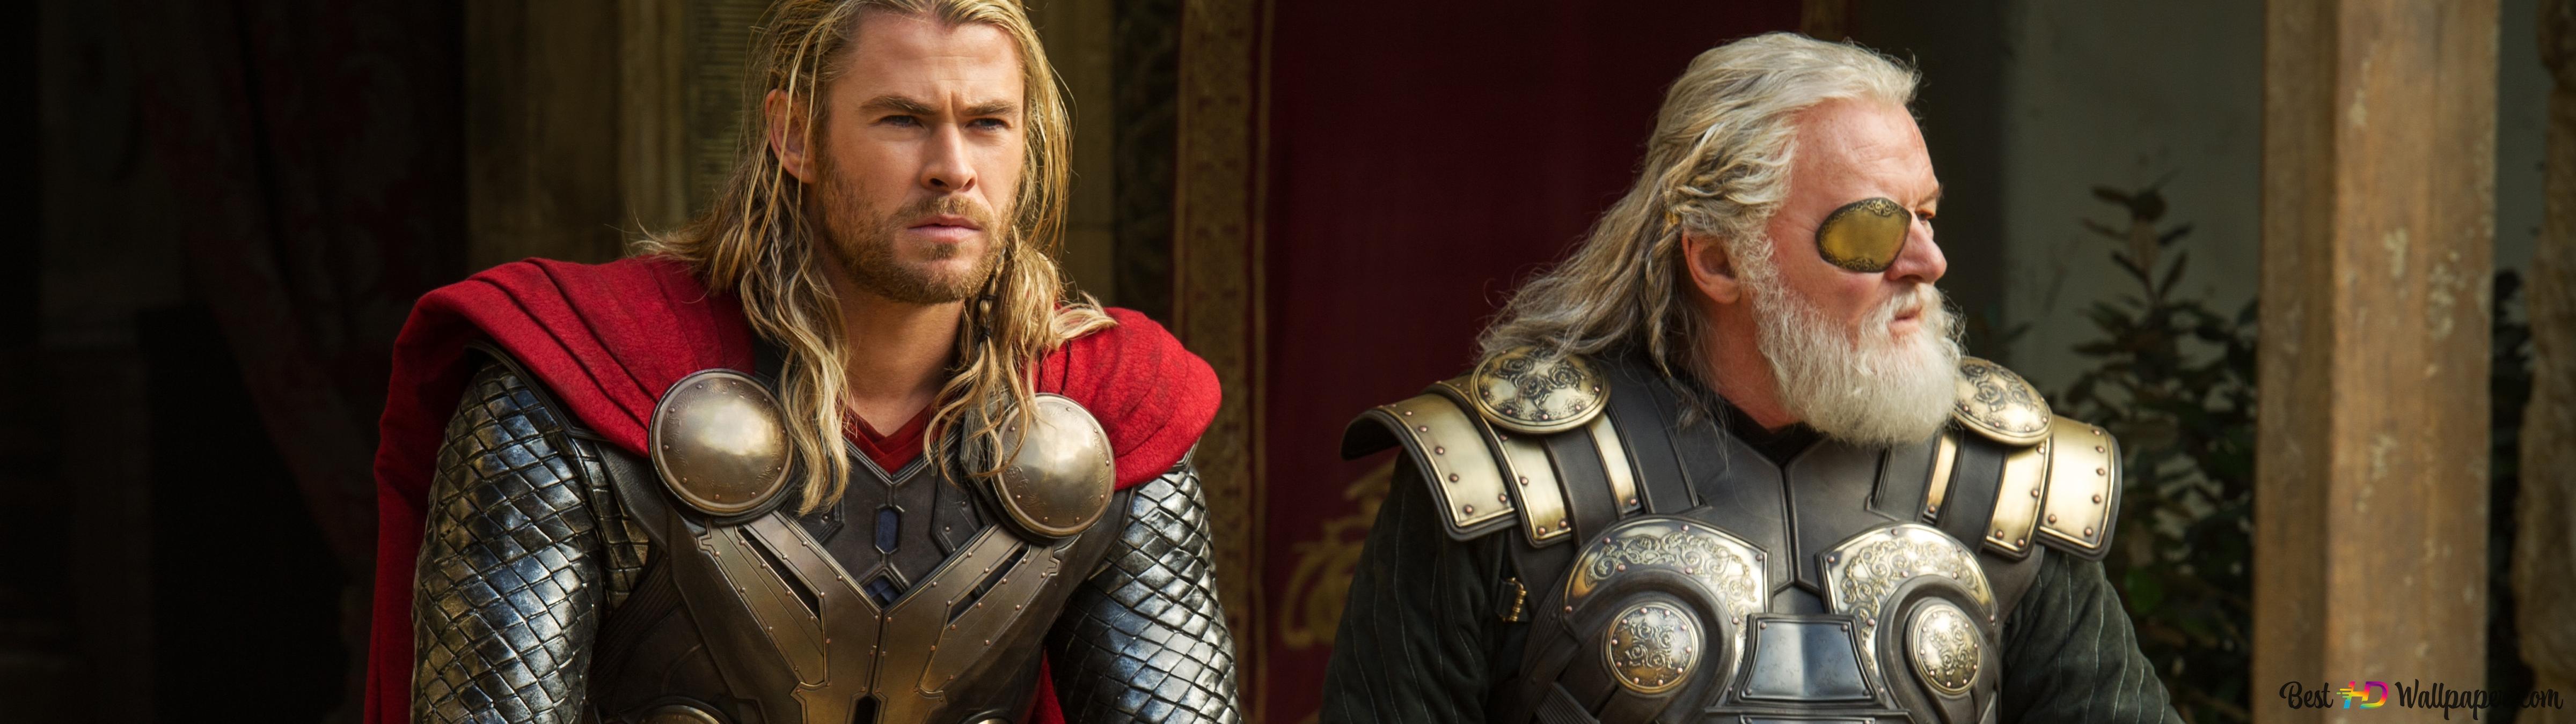 Thor Ragnarok Odin King Of Asgard Hd Wallpaper Download